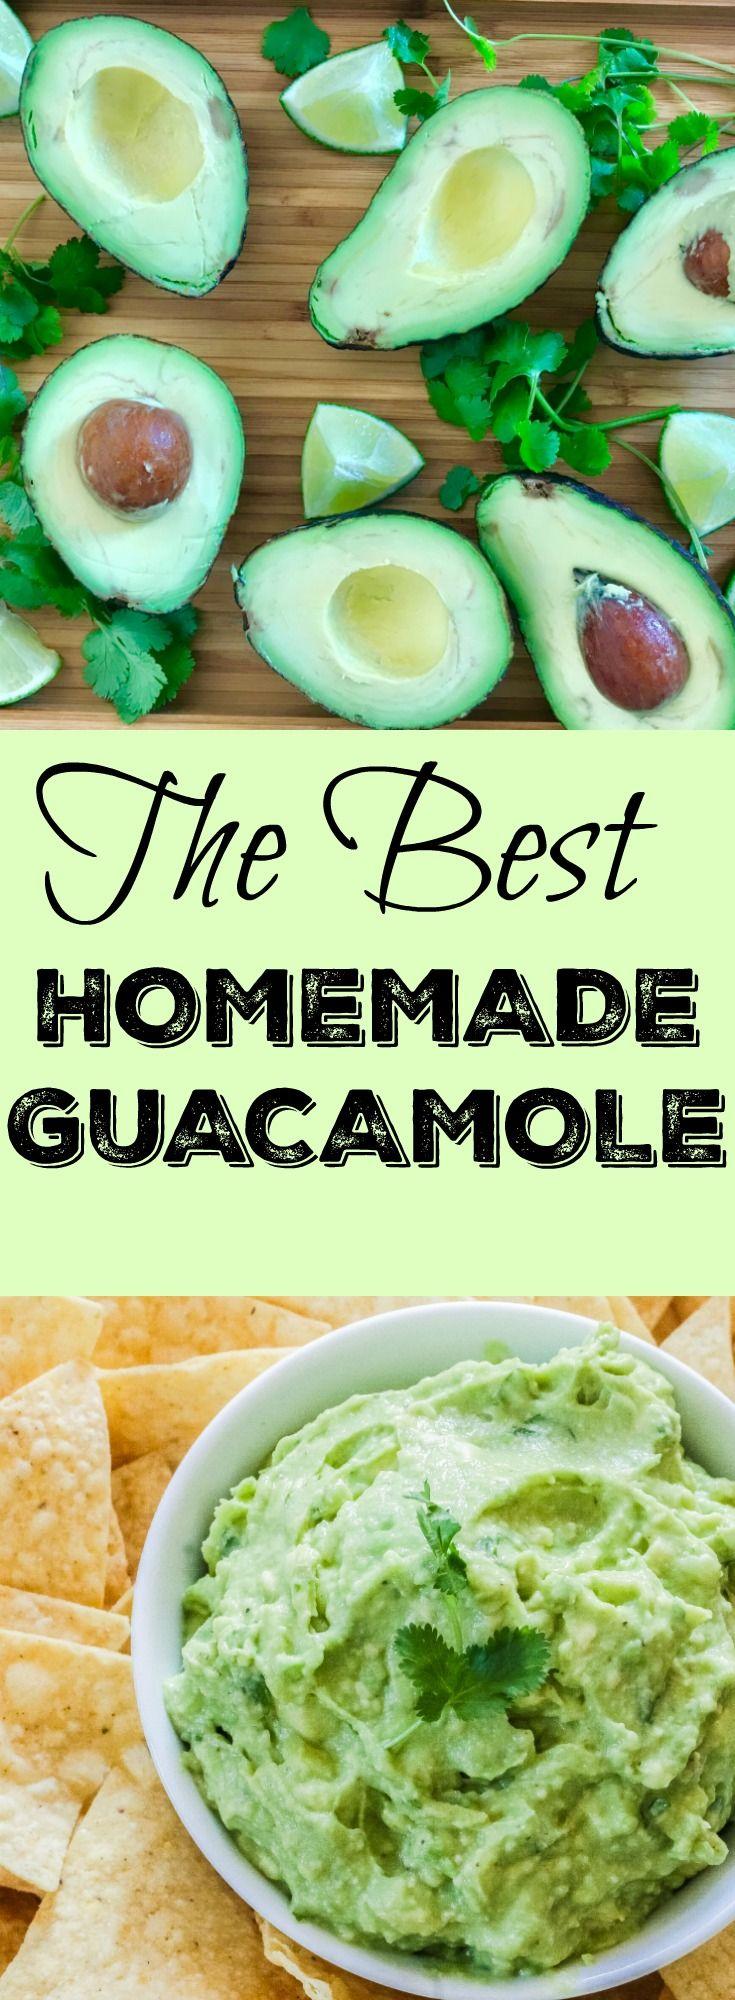 The BEST Homemade Guacamole// Kathryn's Kitchen Blog